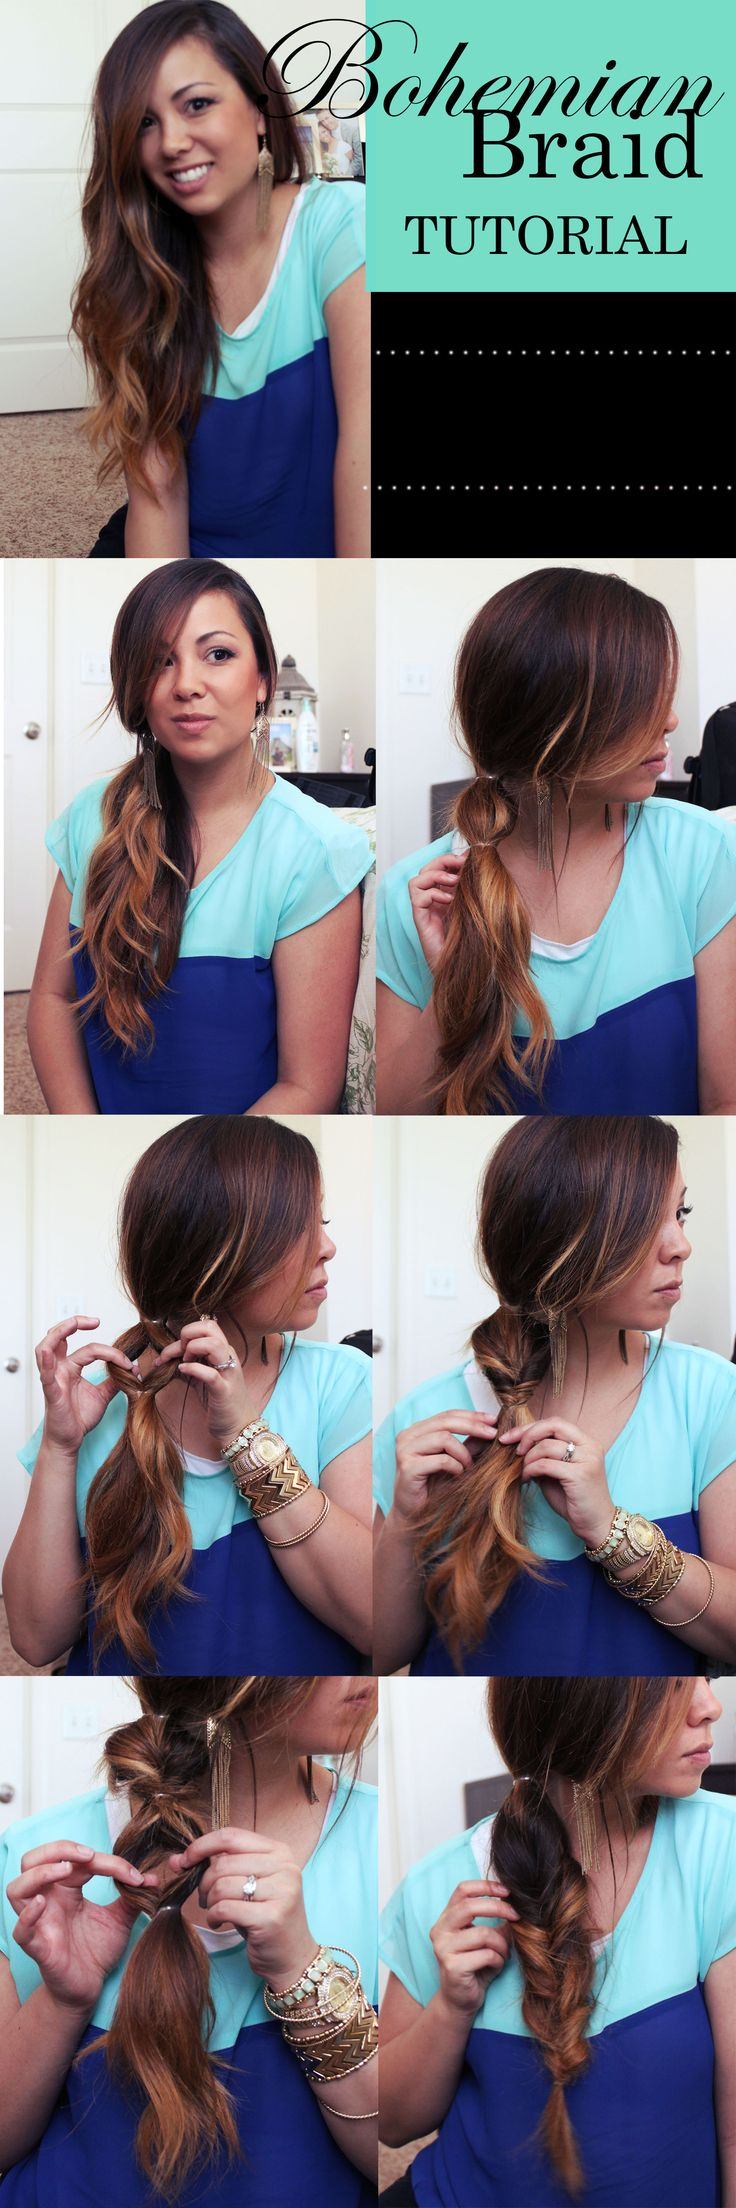 Bohemian braid tuto